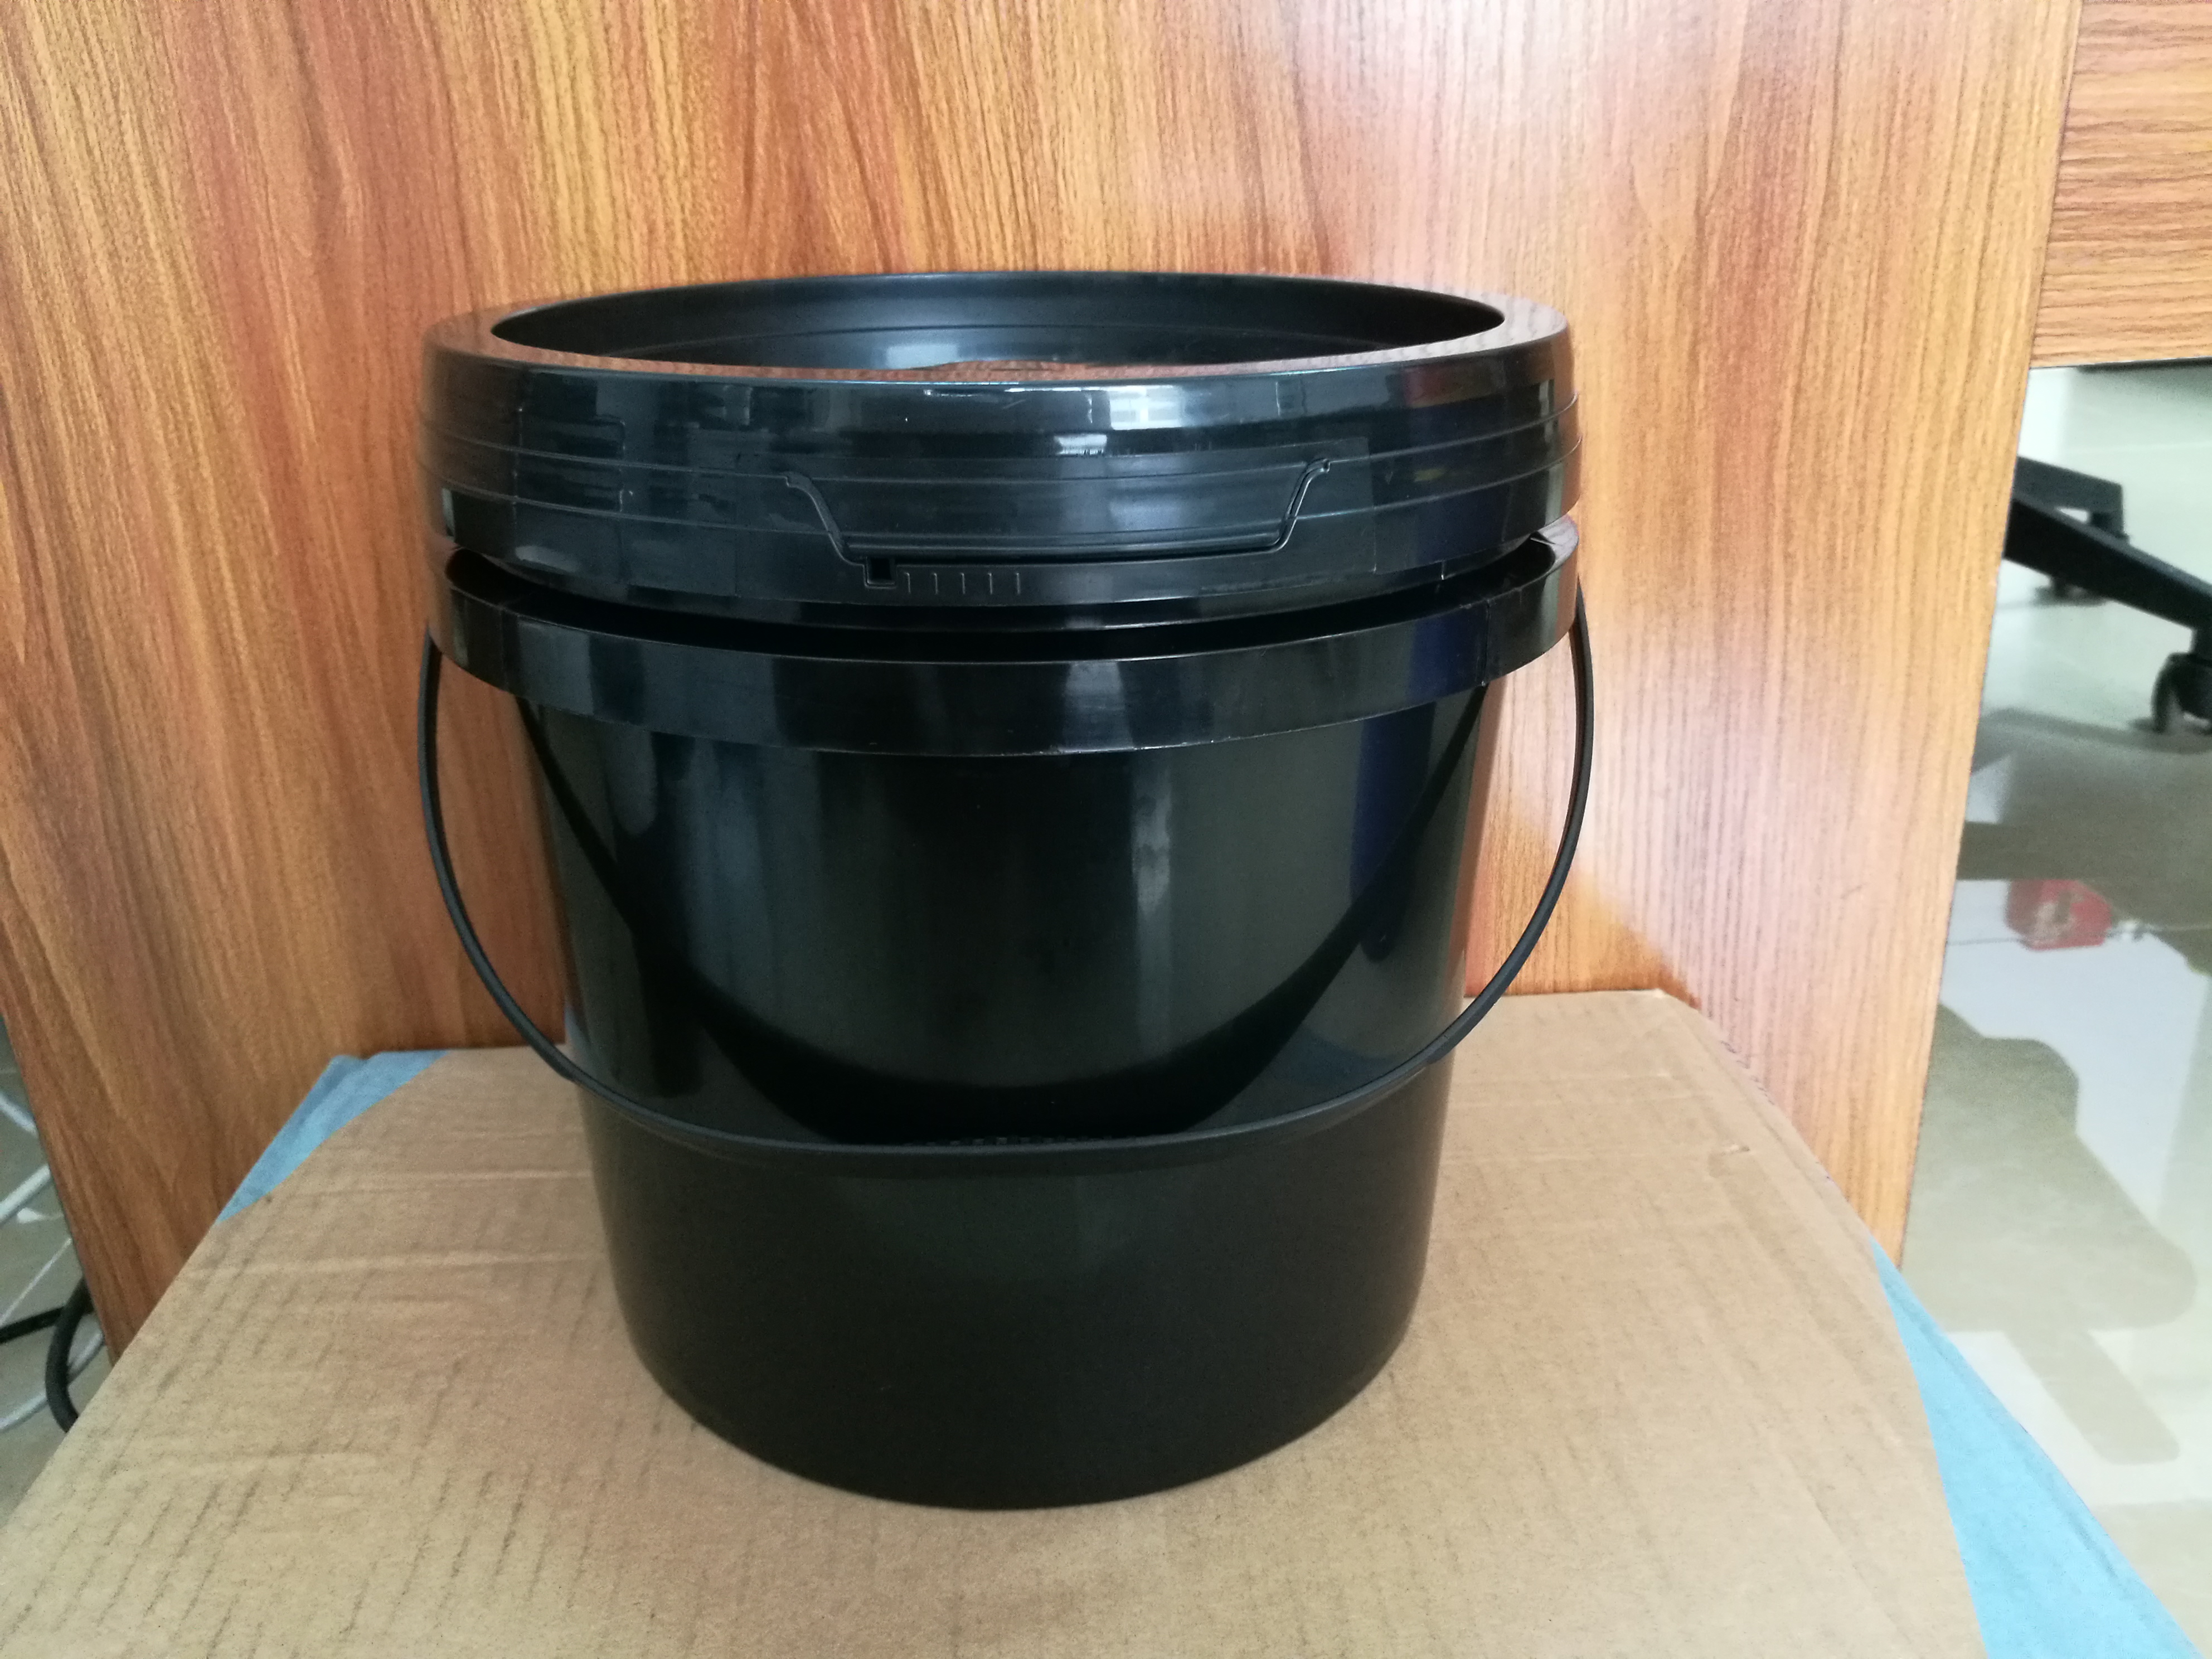 5L塑胶桶制品_厂家直销东莞塑胶良群塑料桶专业厂家_欢迎致电咨询 18L塑胶桶制品 5L塑胶桶制品